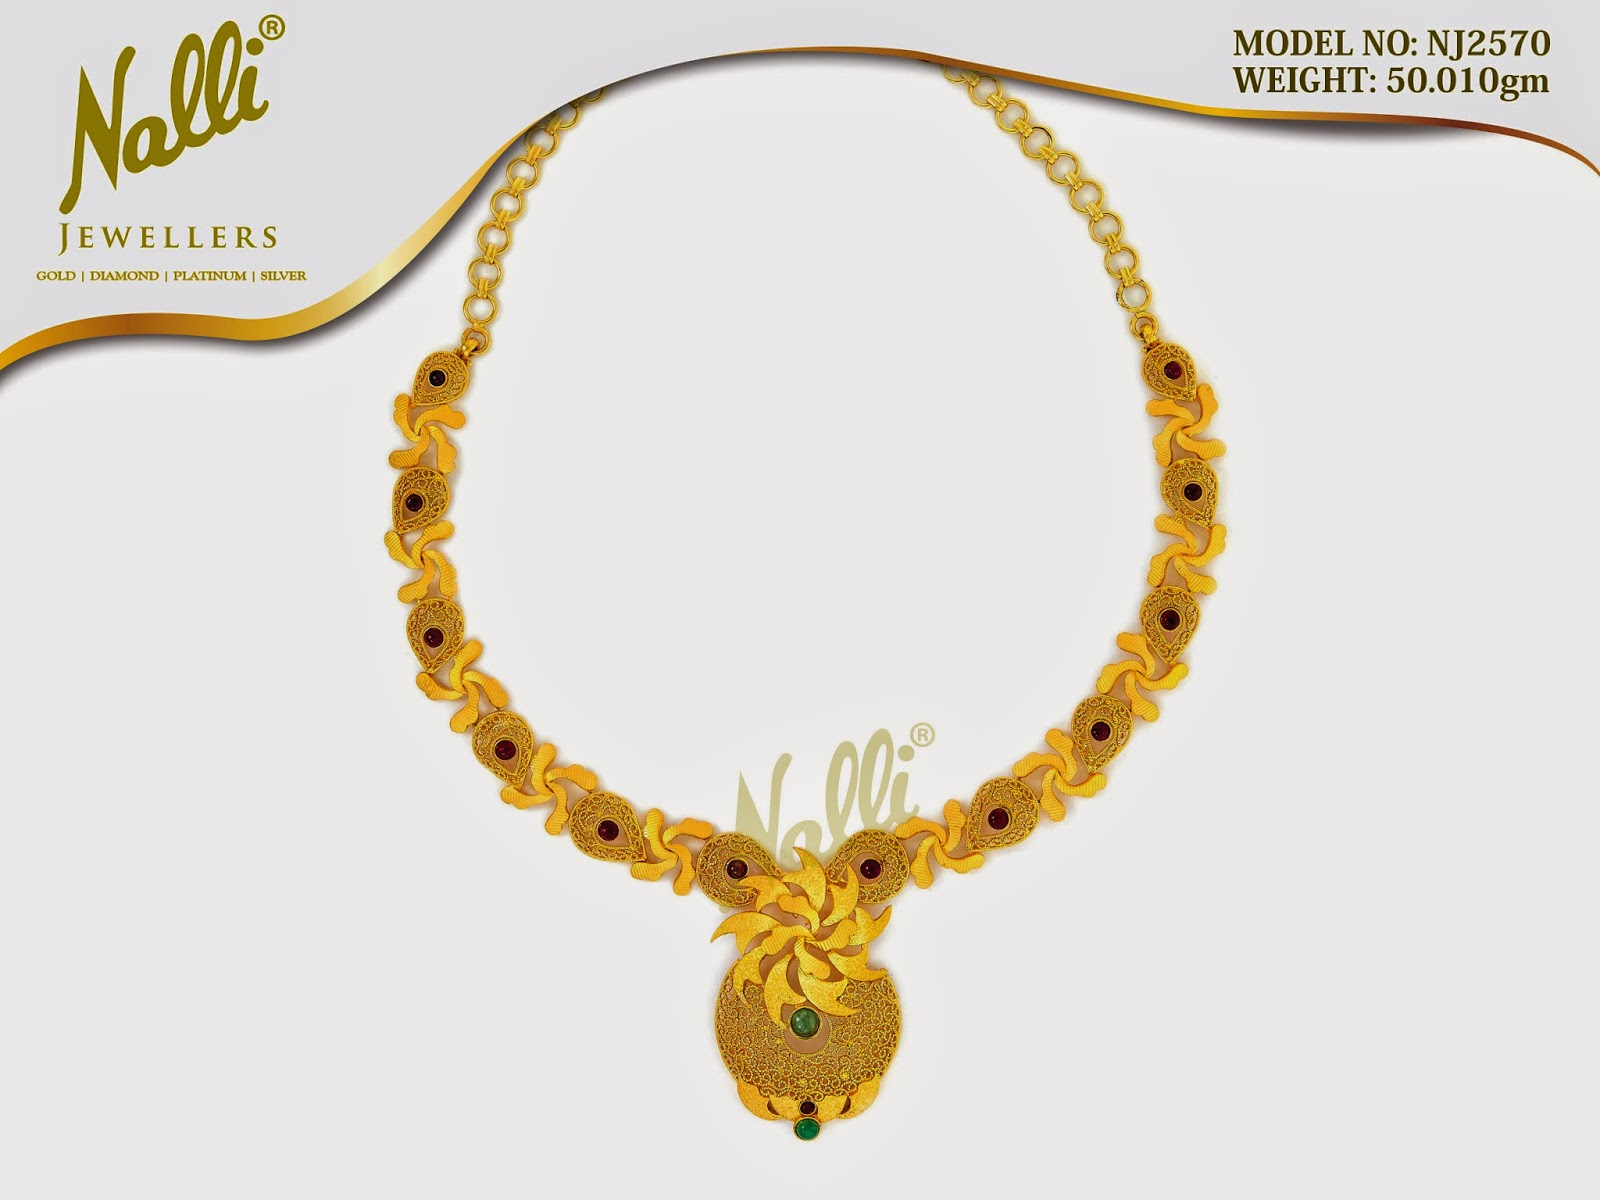 Latest Nalli Jewells Necklace models